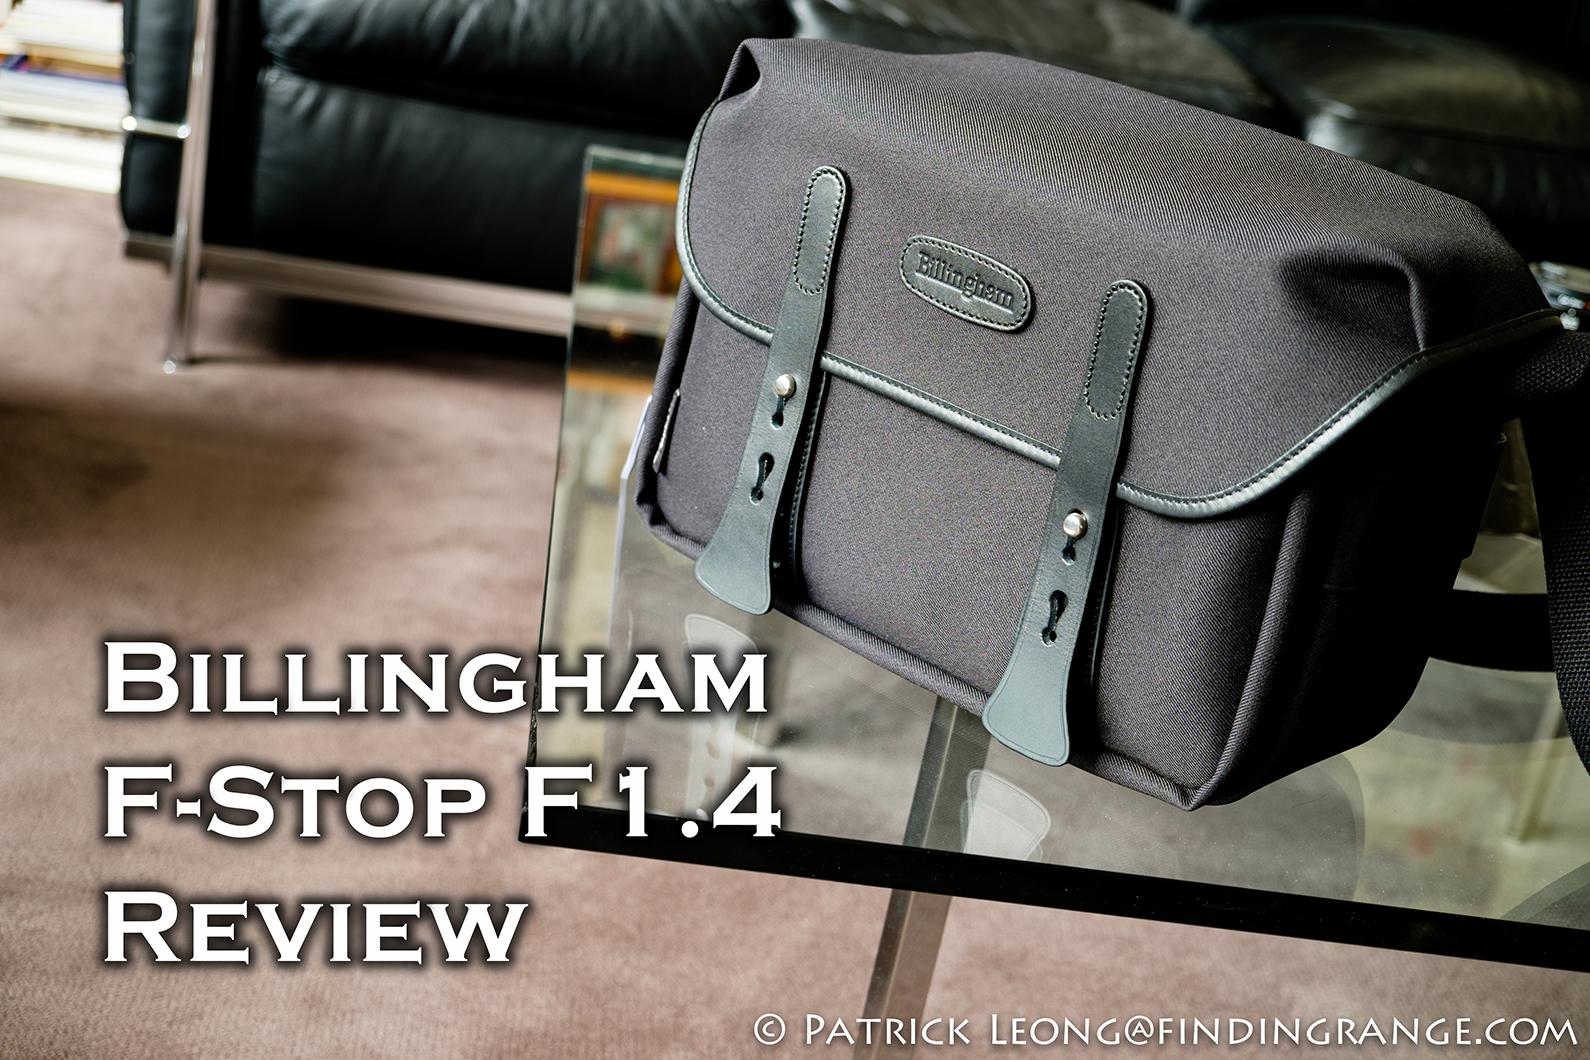 Billingham-F-Stop-1.4-Review-1